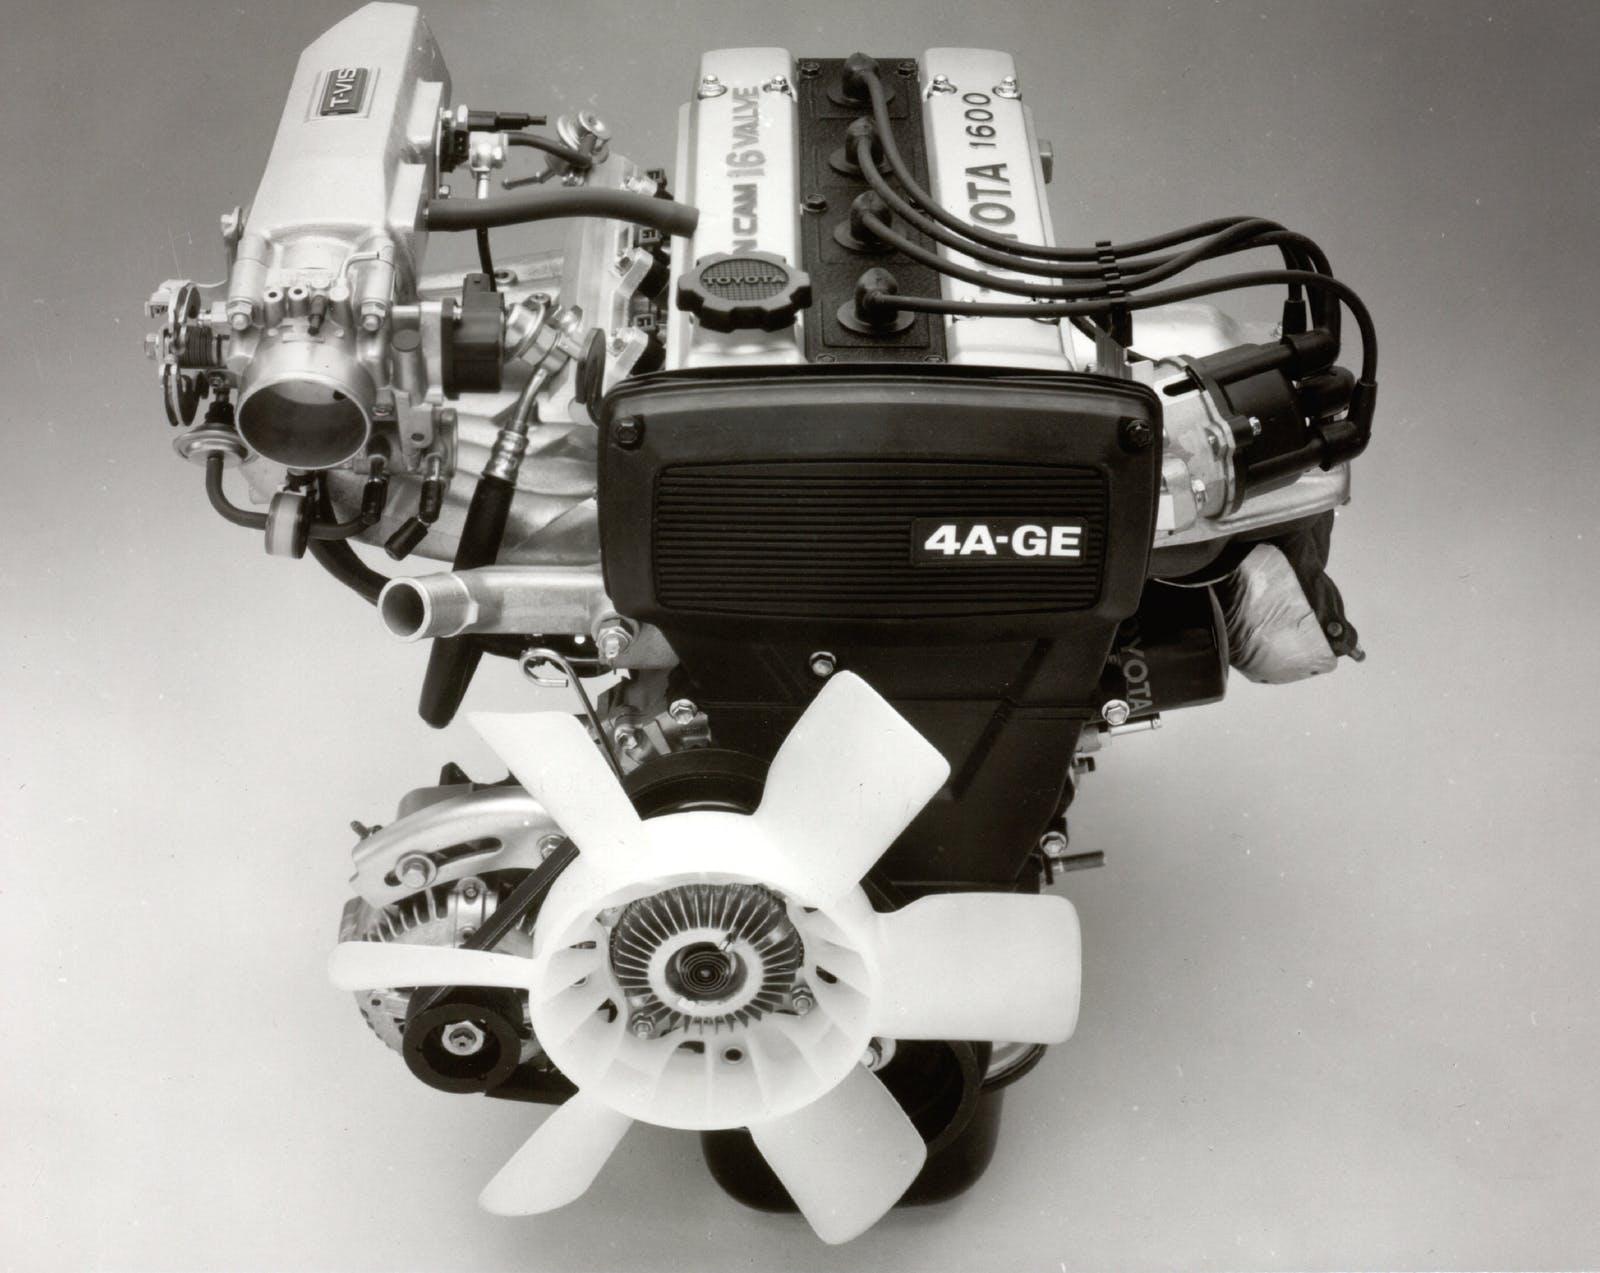 Toyota JDM engines rock hard